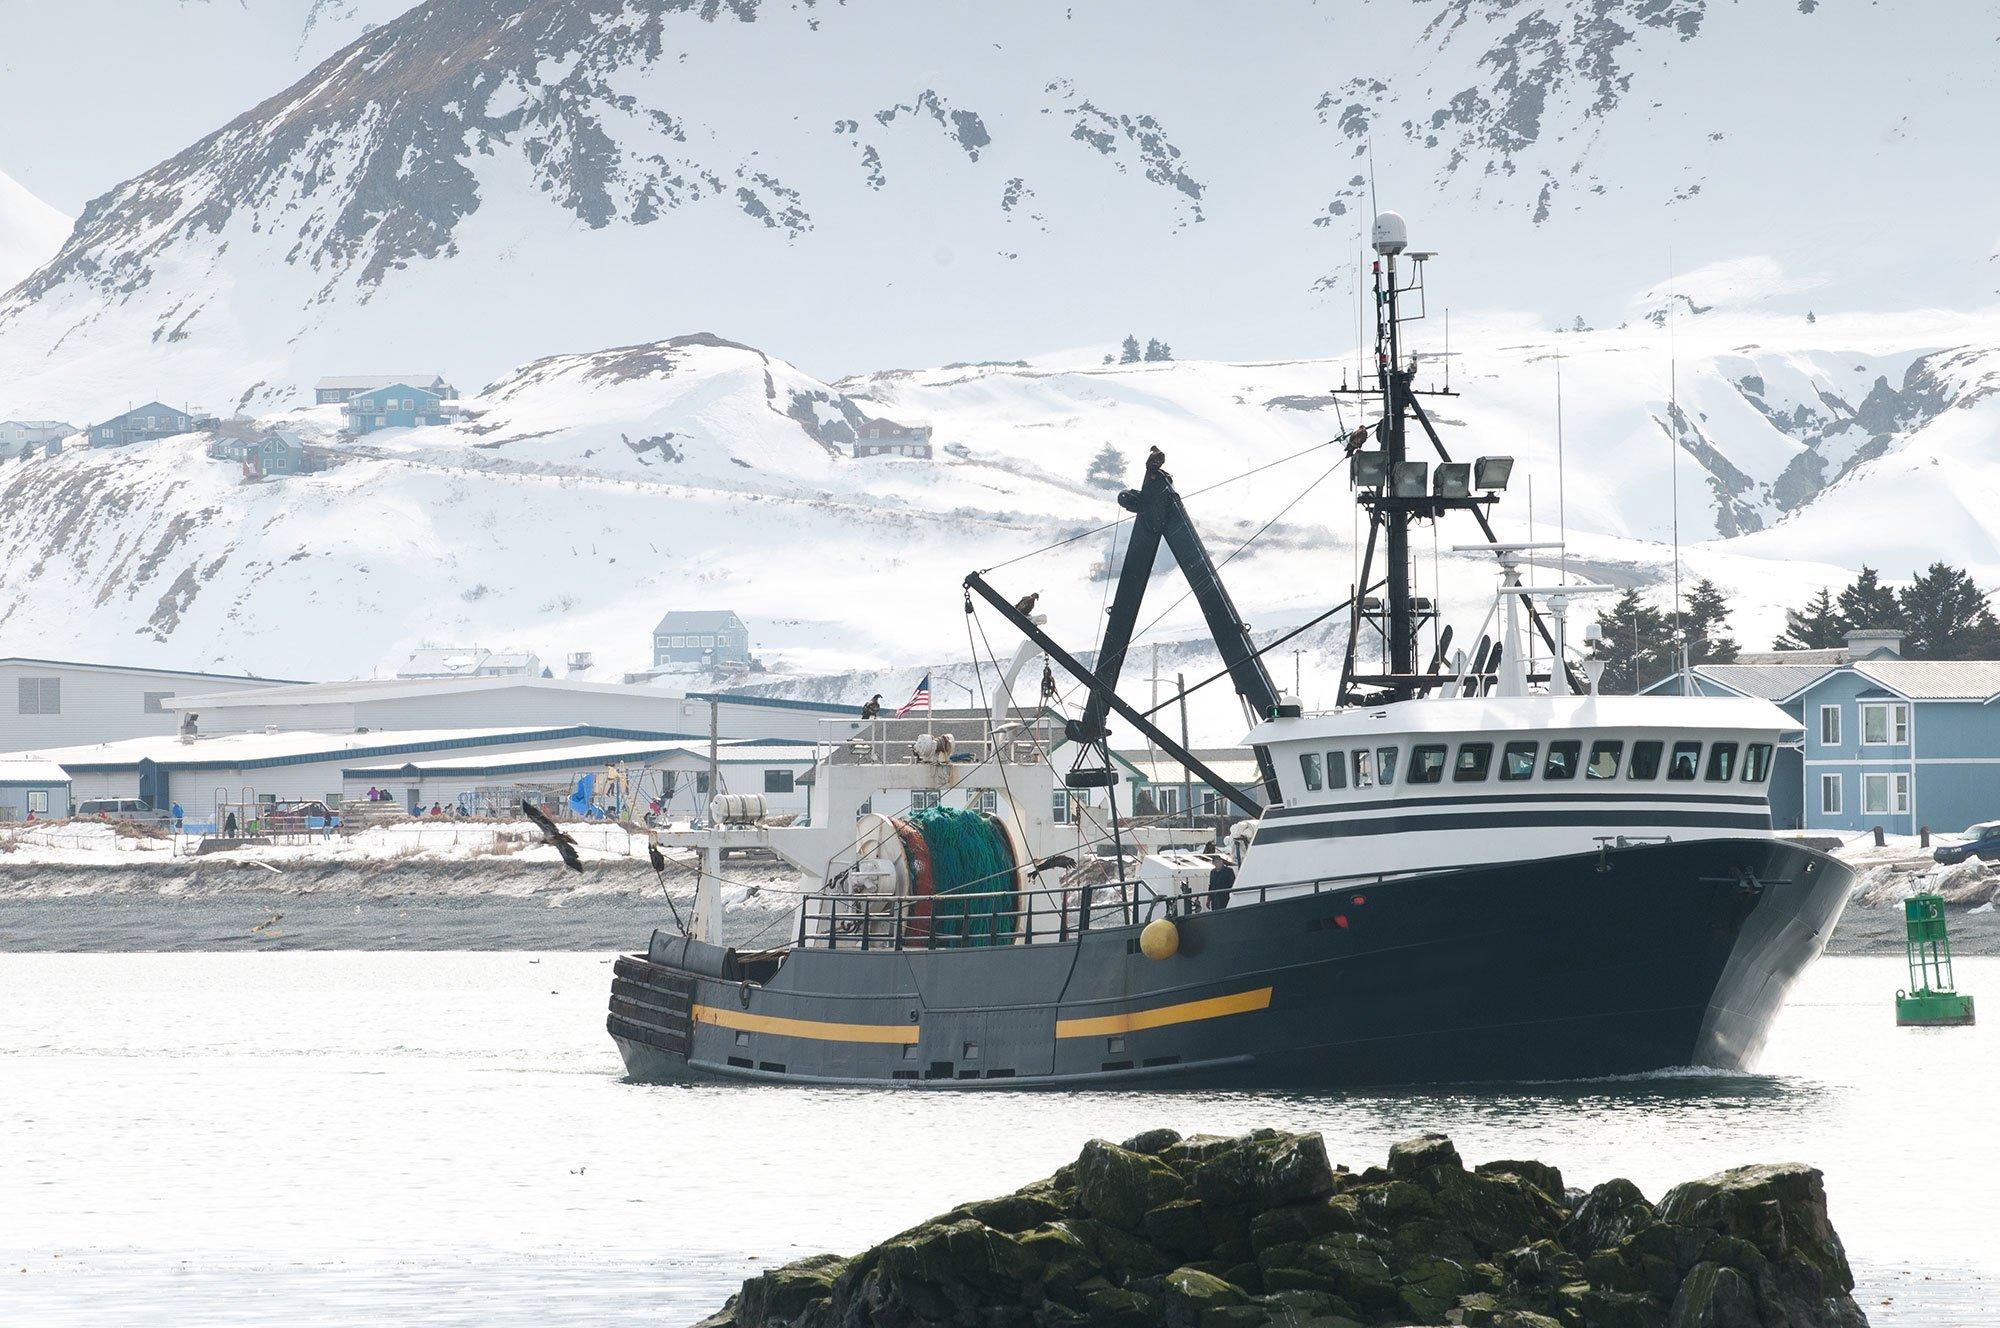 Case Study: Alyeska Seafoods